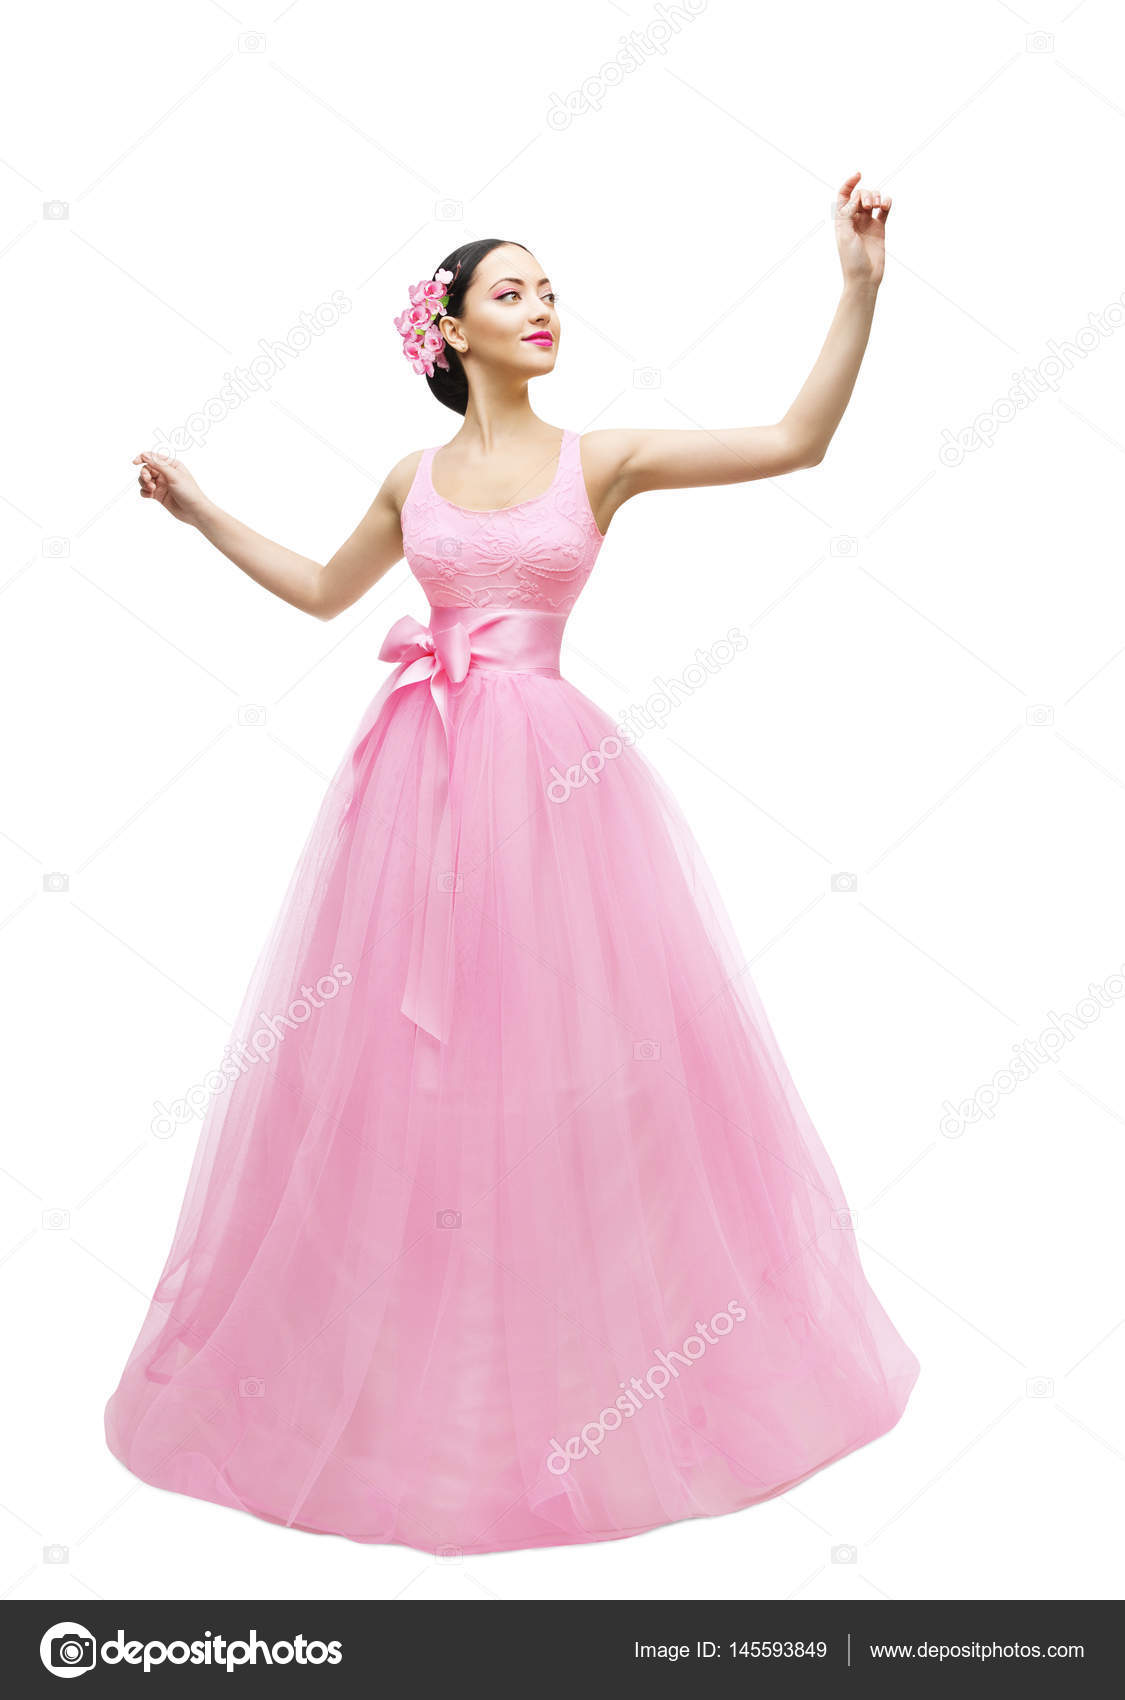 Moda modelo bola vestido, mujer en vestido largo rosa, chica joven ...